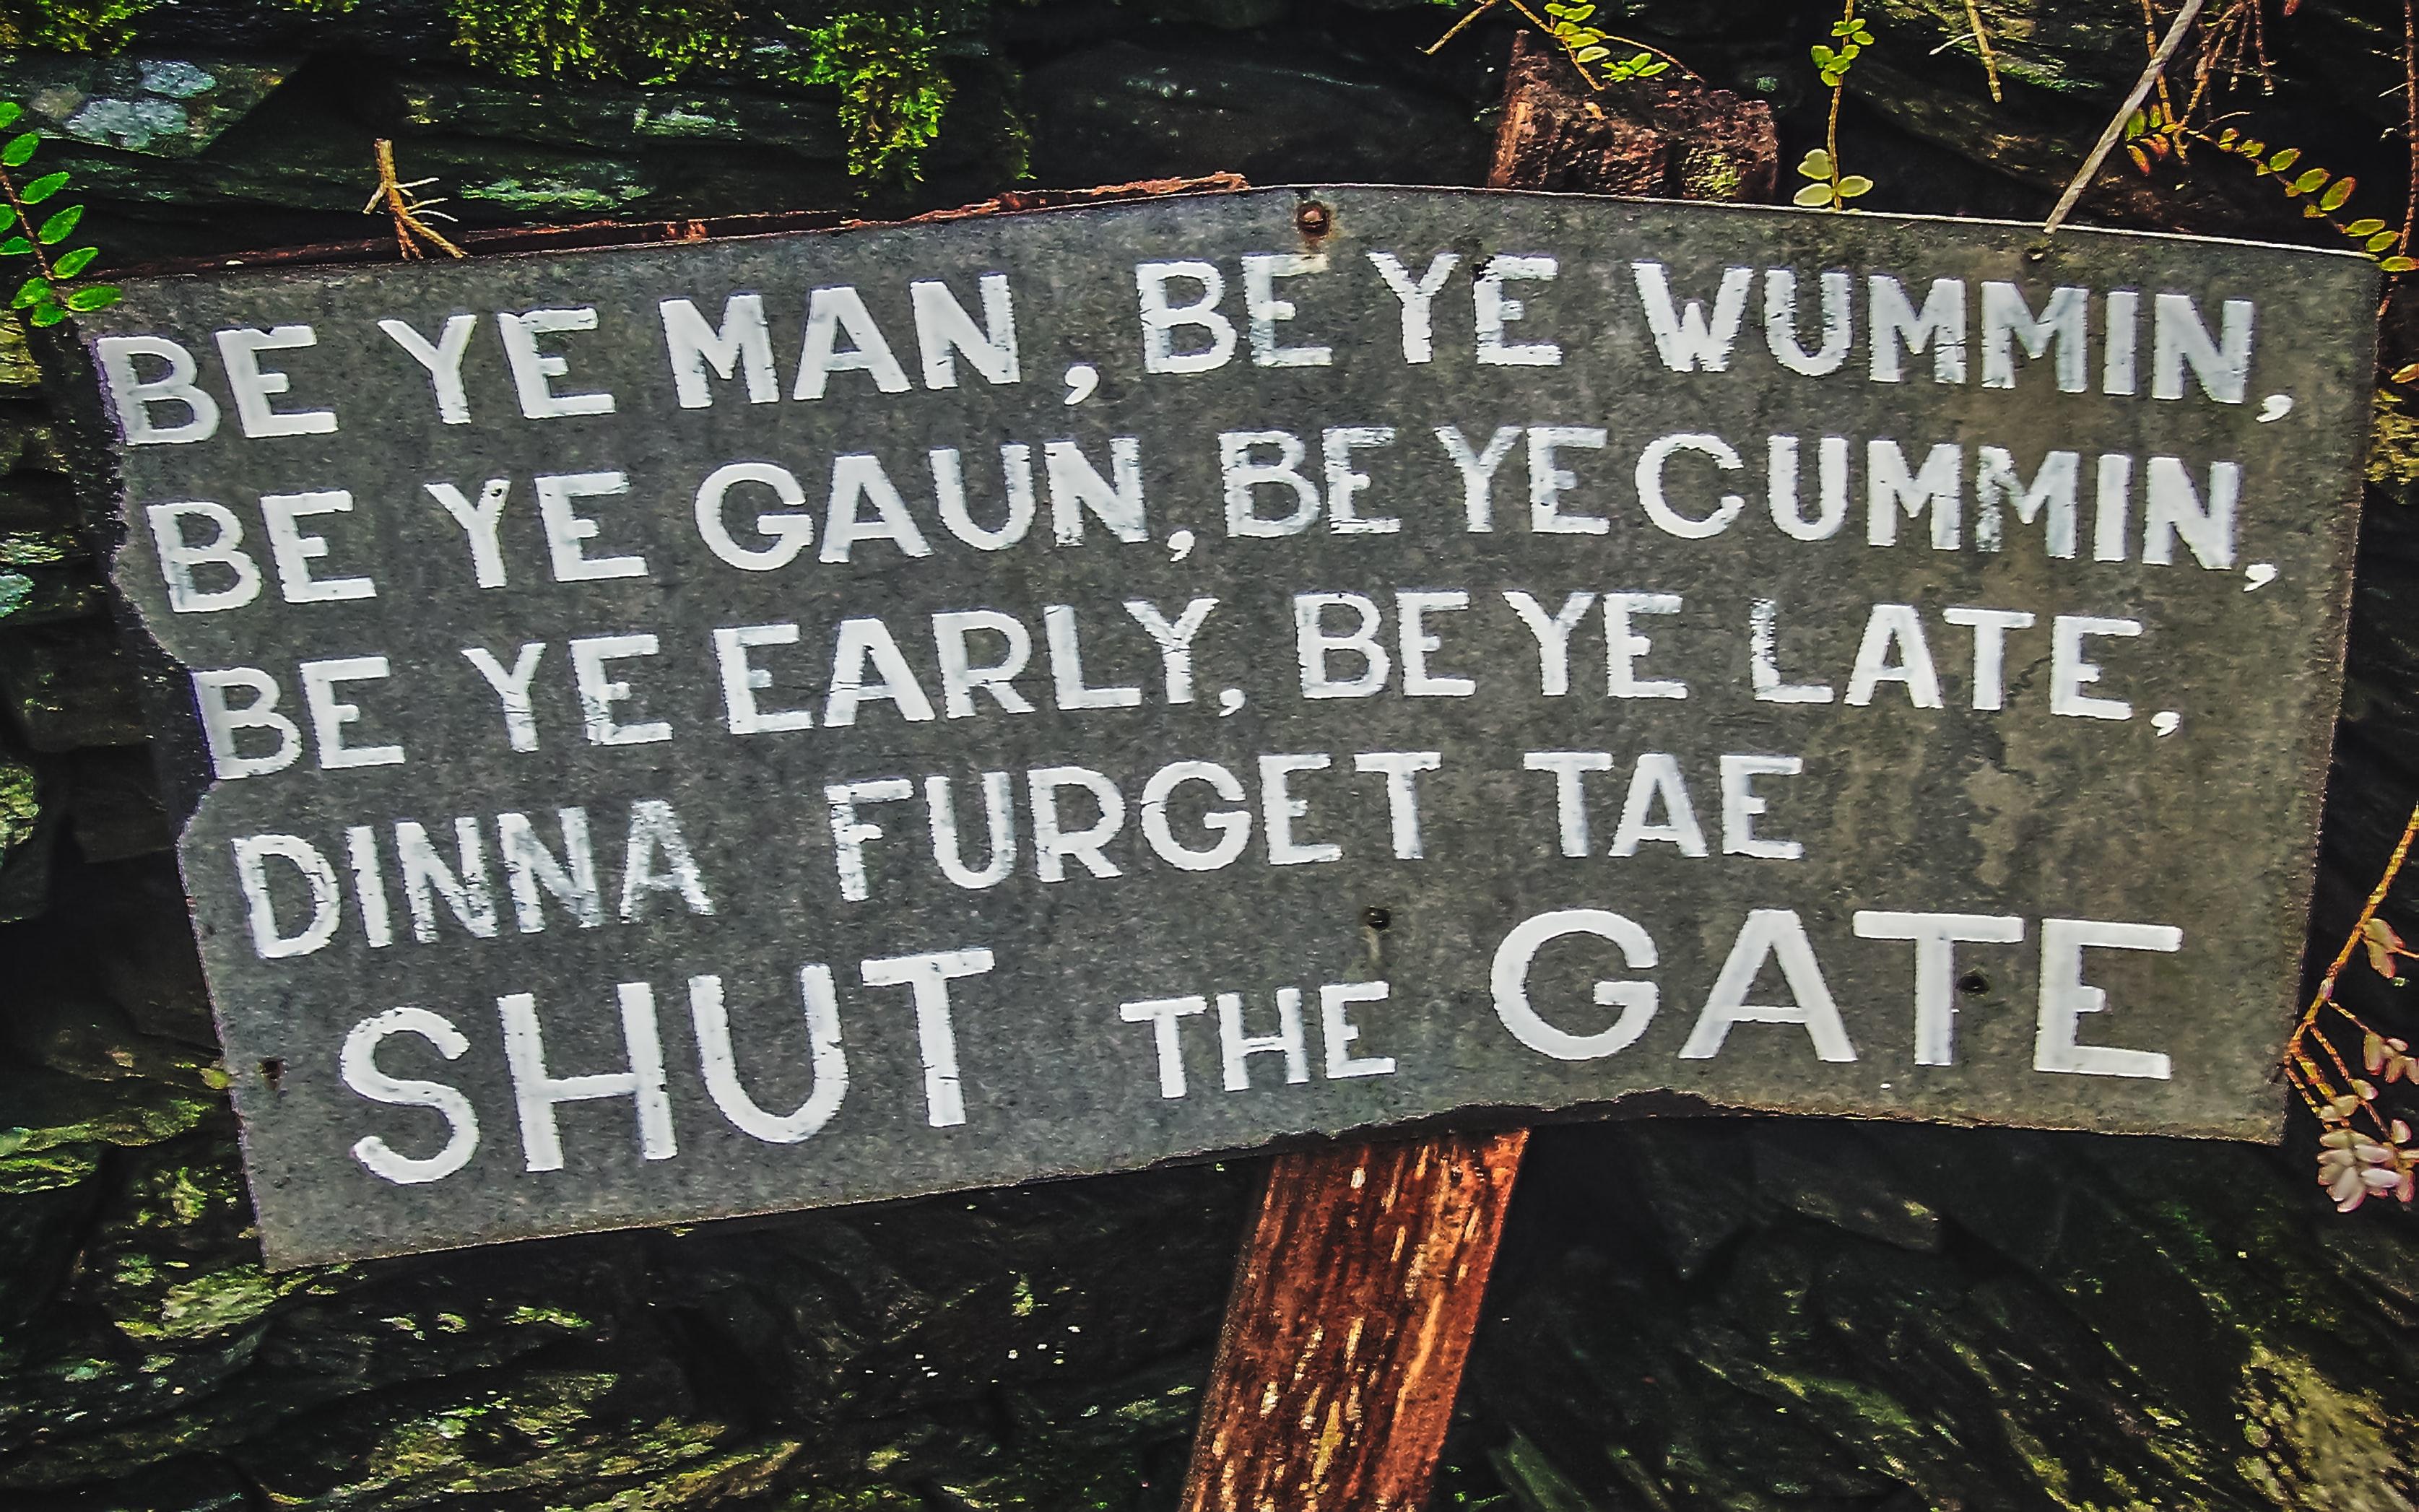 Sign which reads, Be ye man, be ye wumman, be ye gaun, be ye cummin, be ye early, be ye late, dinna furget tea shut the gate.